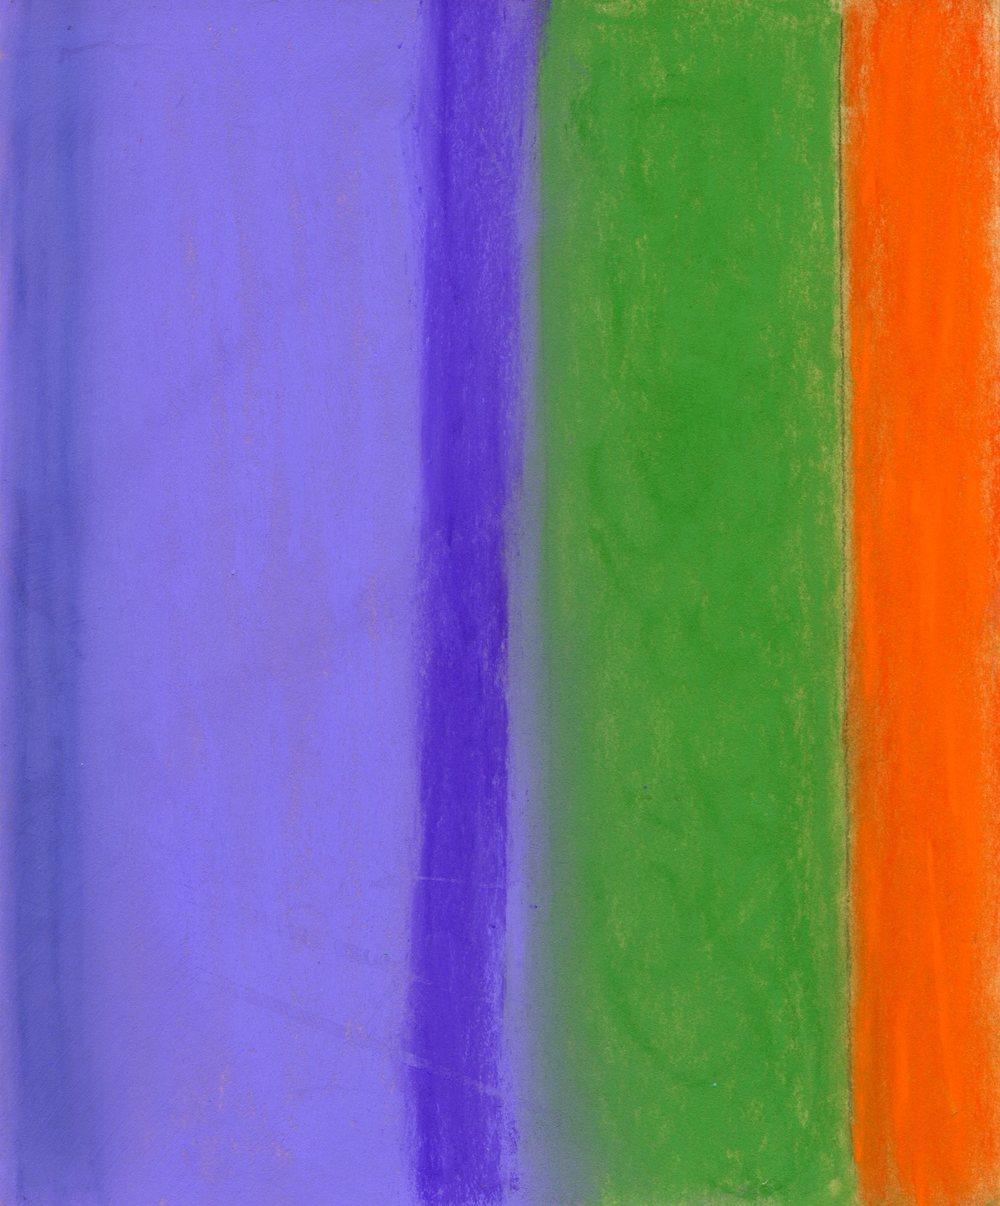 color010.jpg